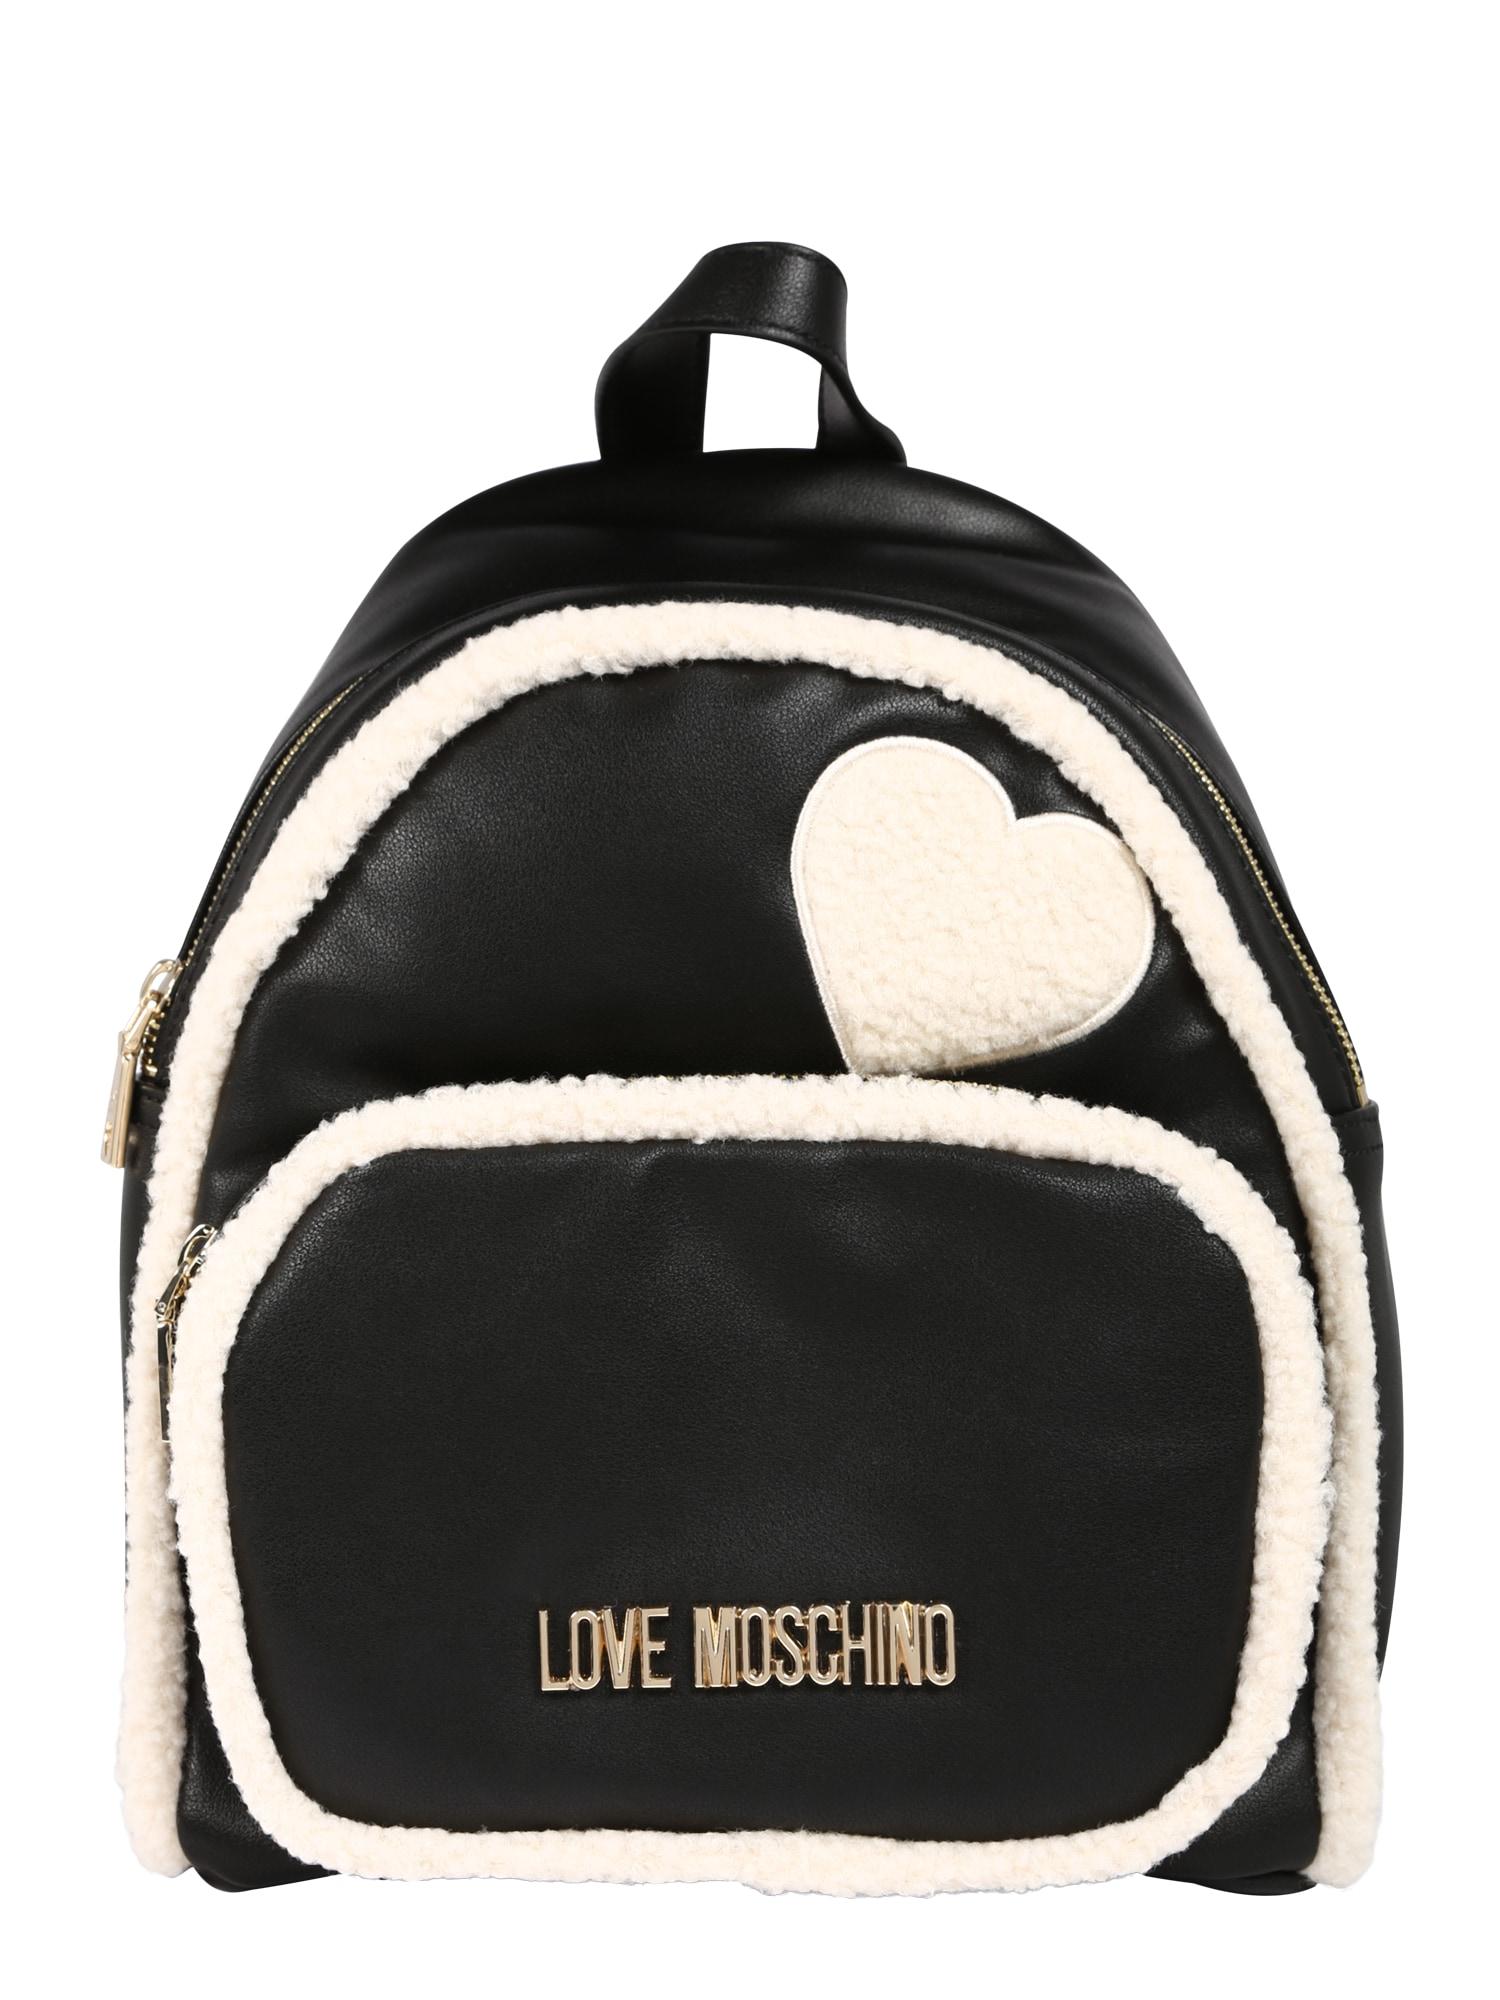 Batoh BORSA PU NEROECO SHEARLING AVORIO krémová Love Moschino